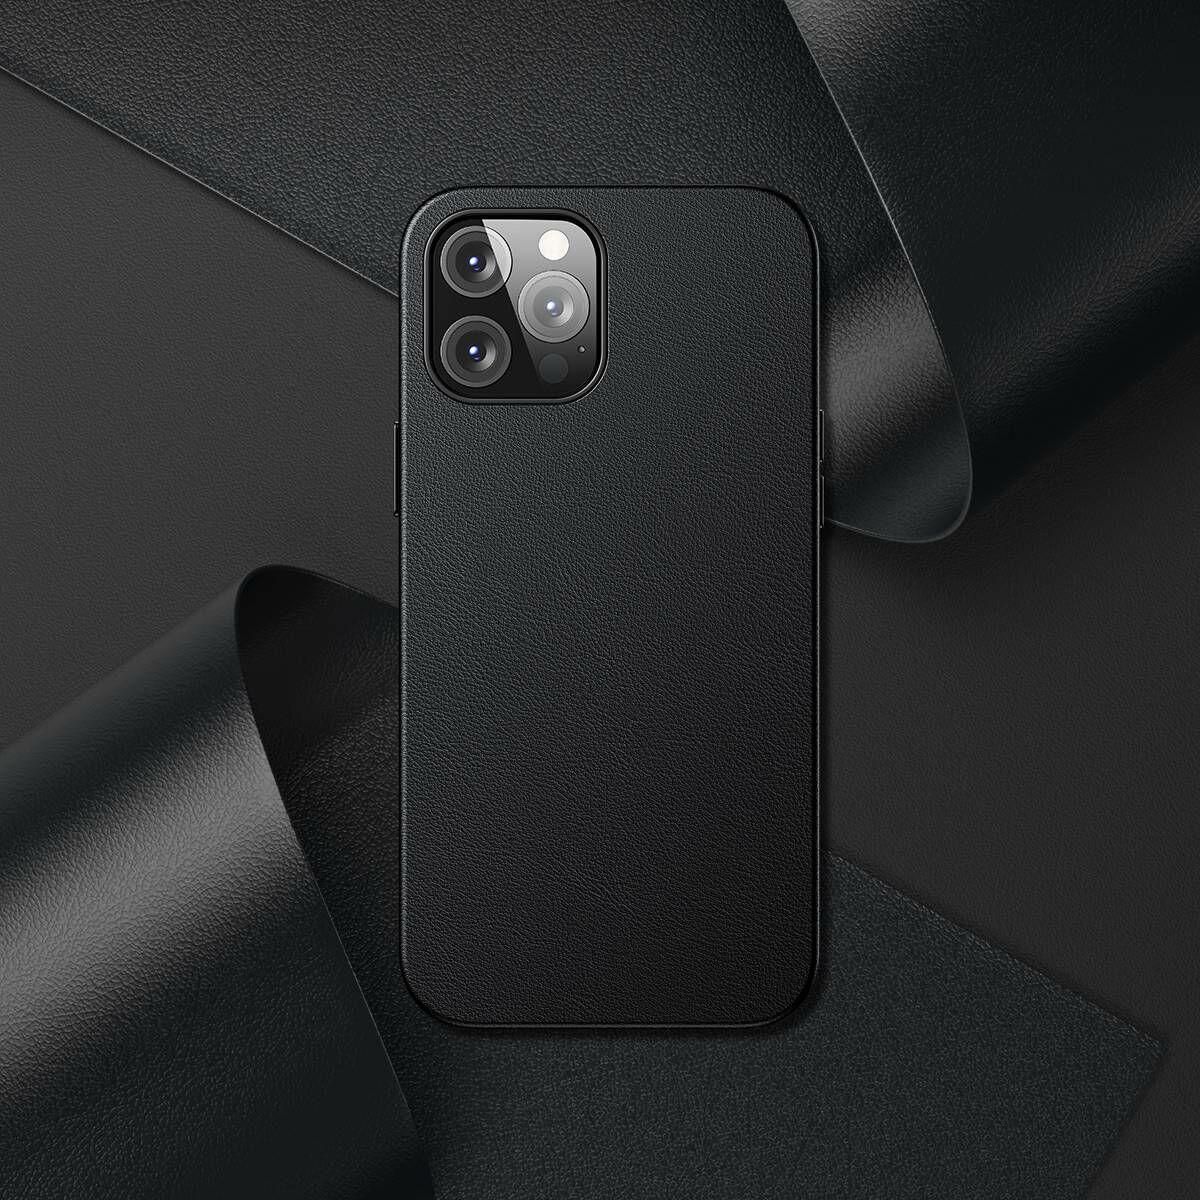 Baseus iPhone 12 Pro Max tok, Original Magnetic, fekete (LTAPIPH67N-YP01)